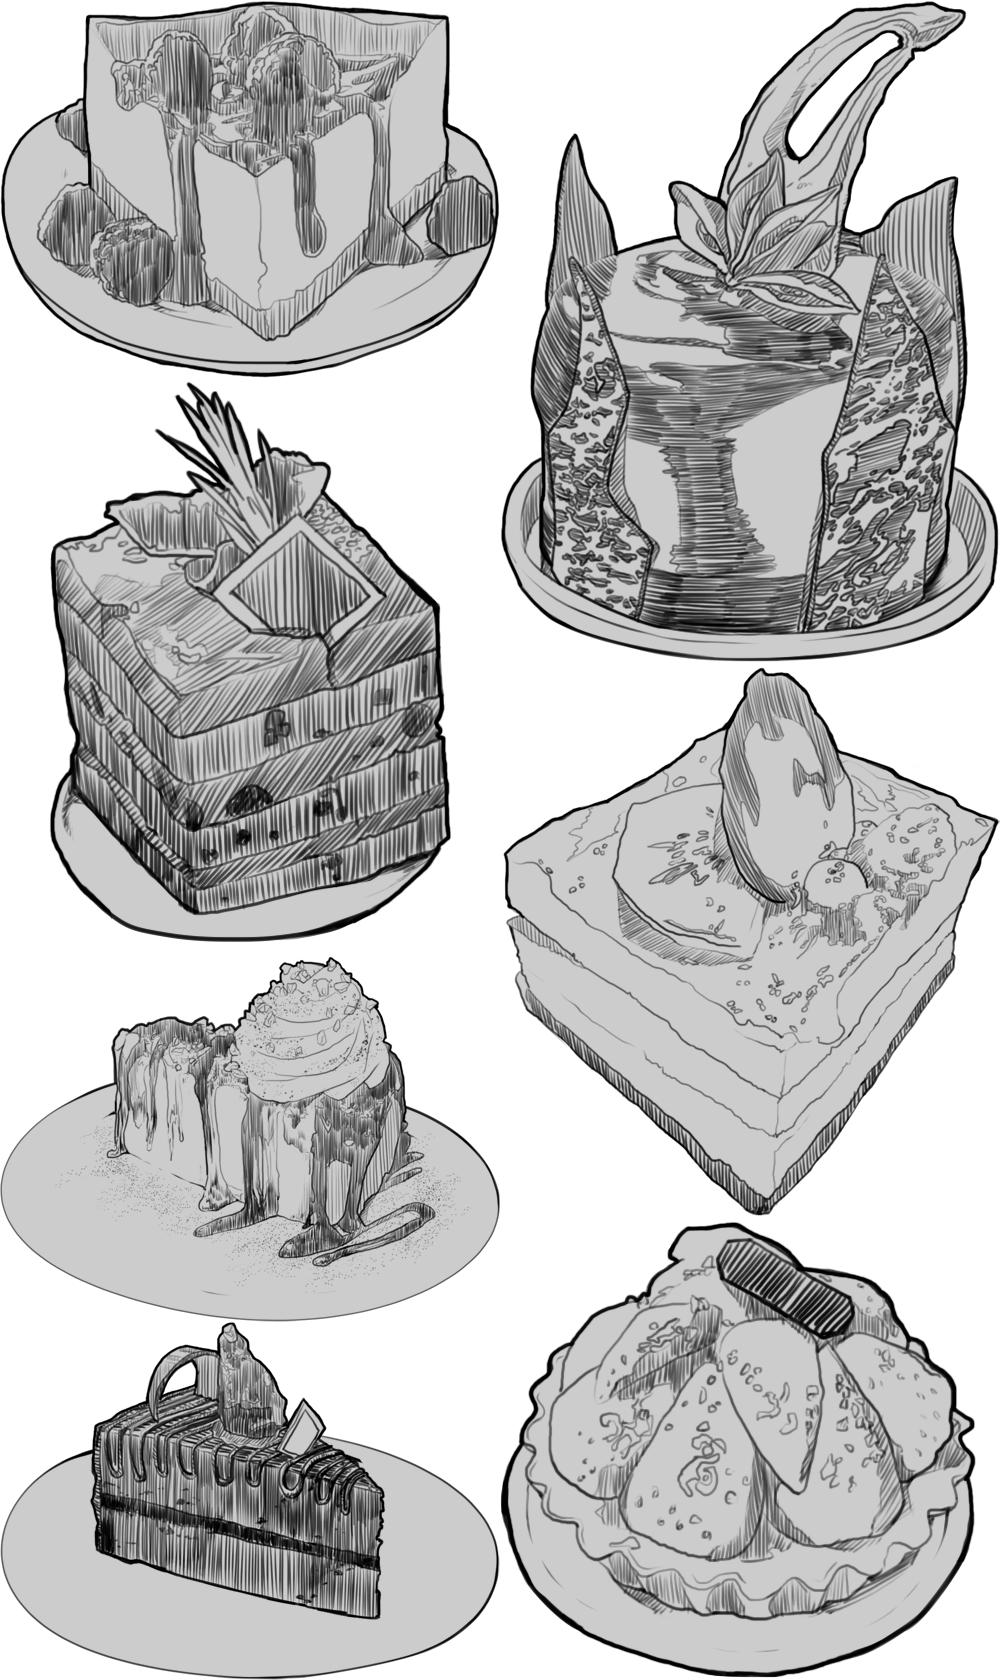 [iff] 케이크